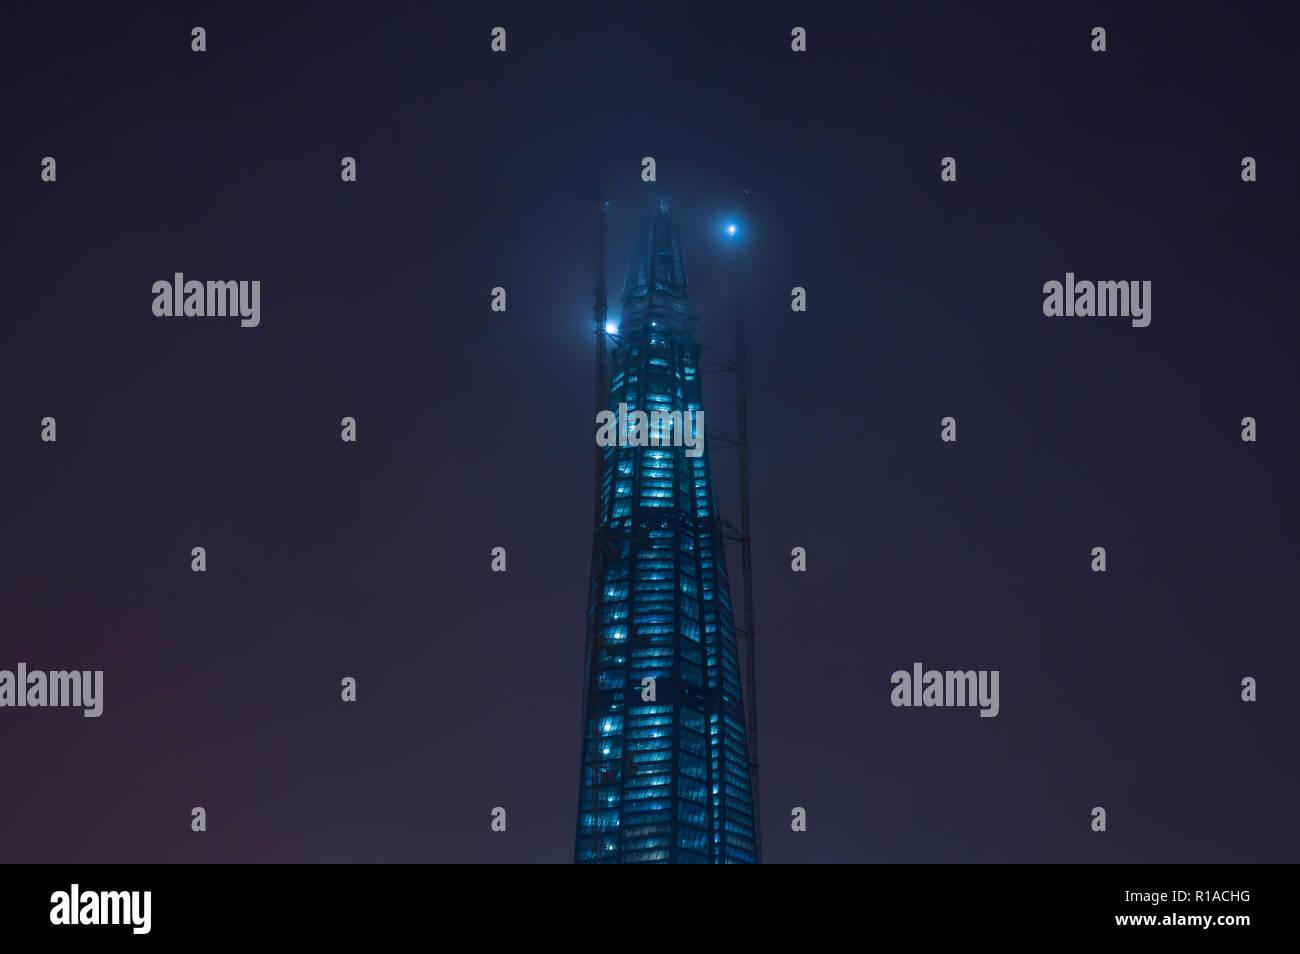 Skyscraper construction at nicht - Stock Image